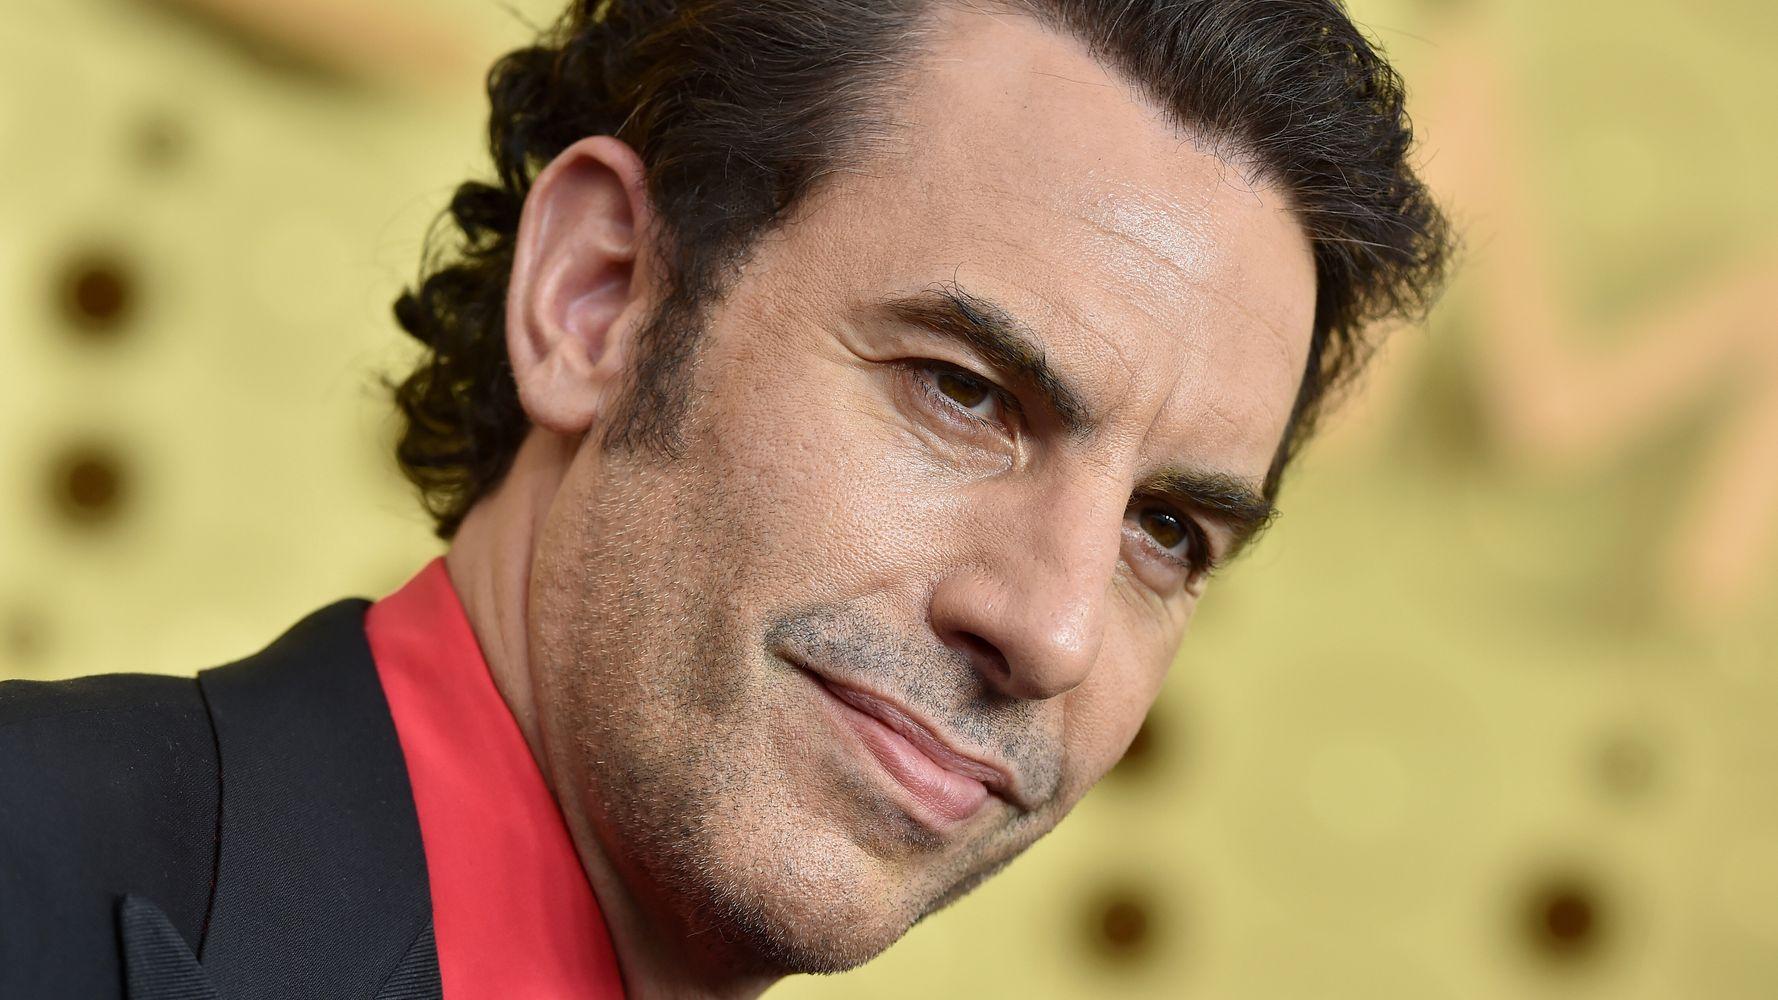 Sacha Baron Cohen: 'Borat' Sequel Shows America's 'Slide Into Authoritarianism'